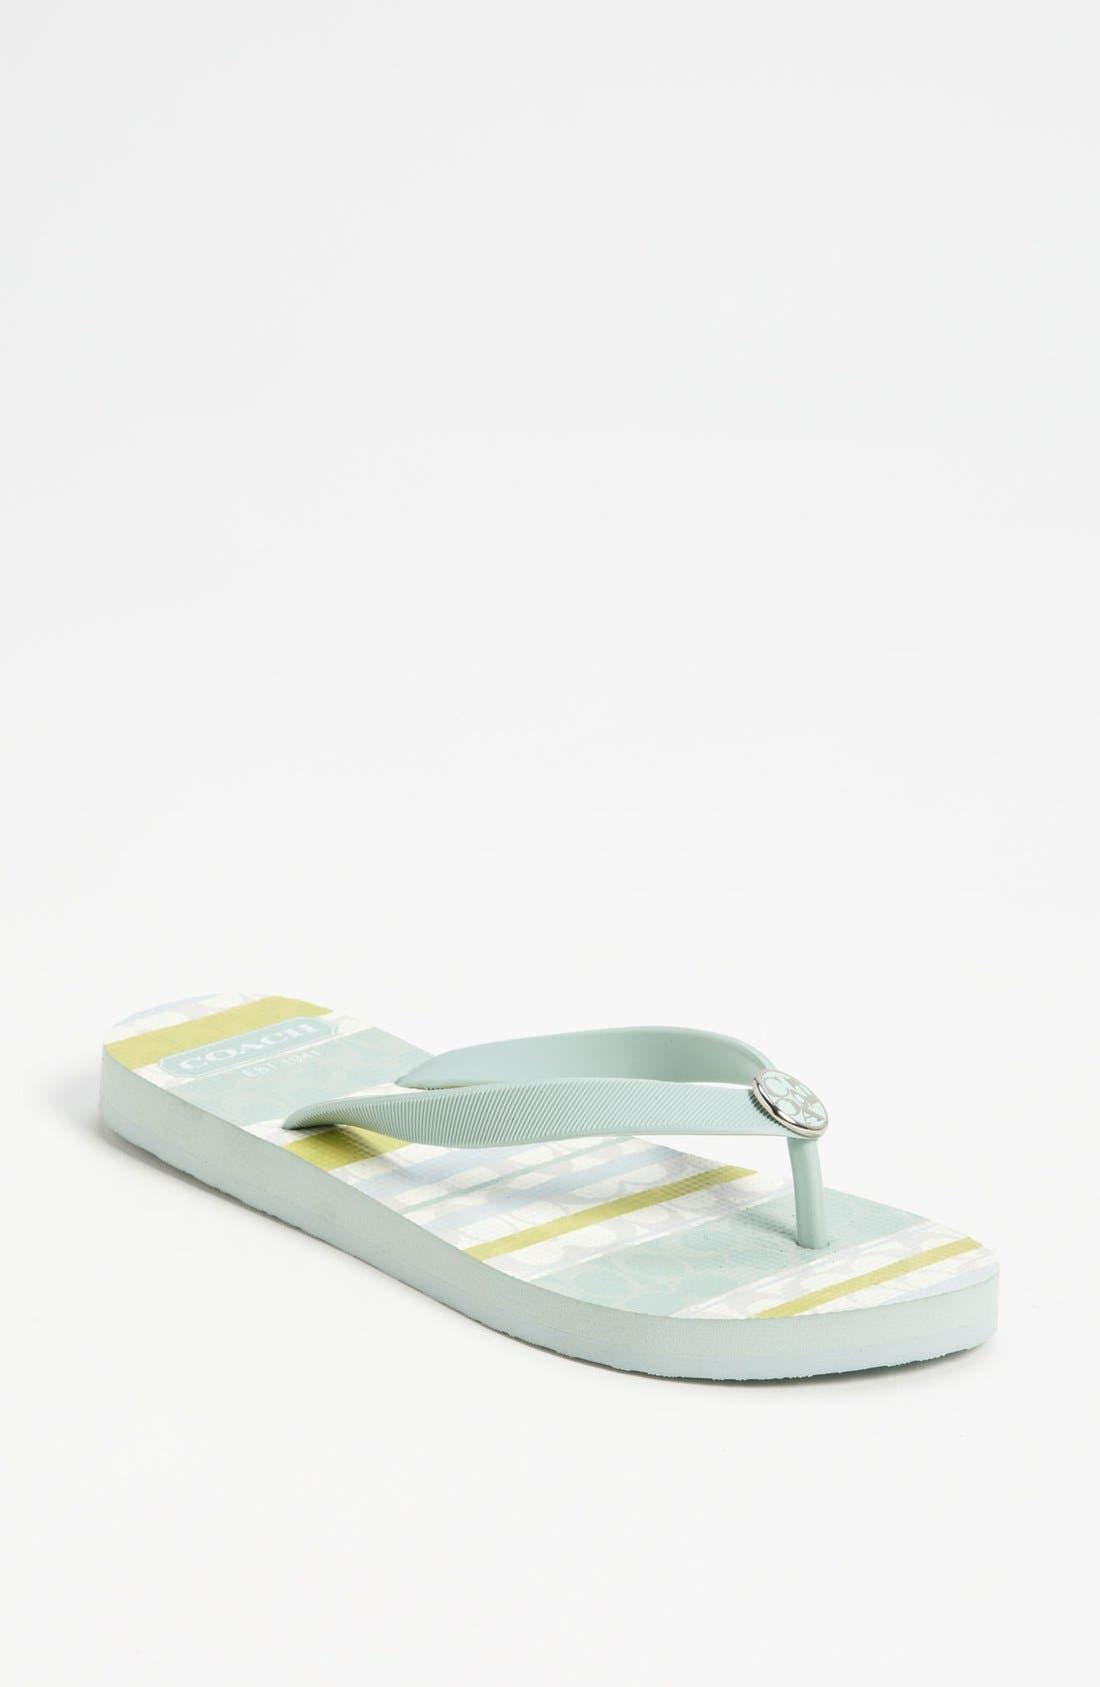 Main Image - COACH 'Alessa' Flip Flop